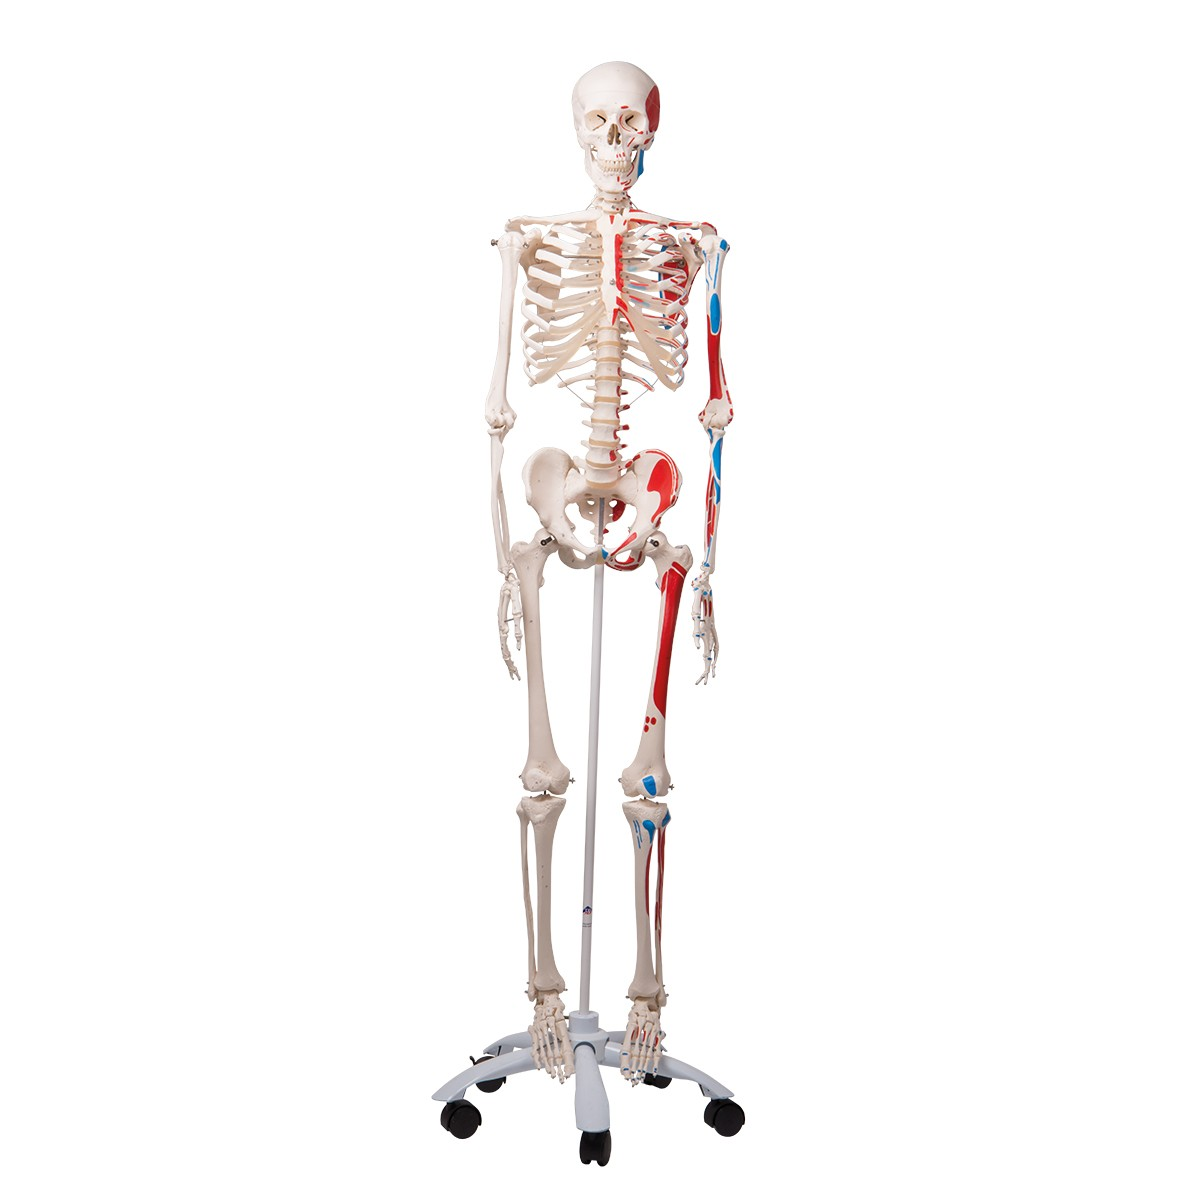 3b Human Skeleton Wmuscles Max Skeletons Skeletal System